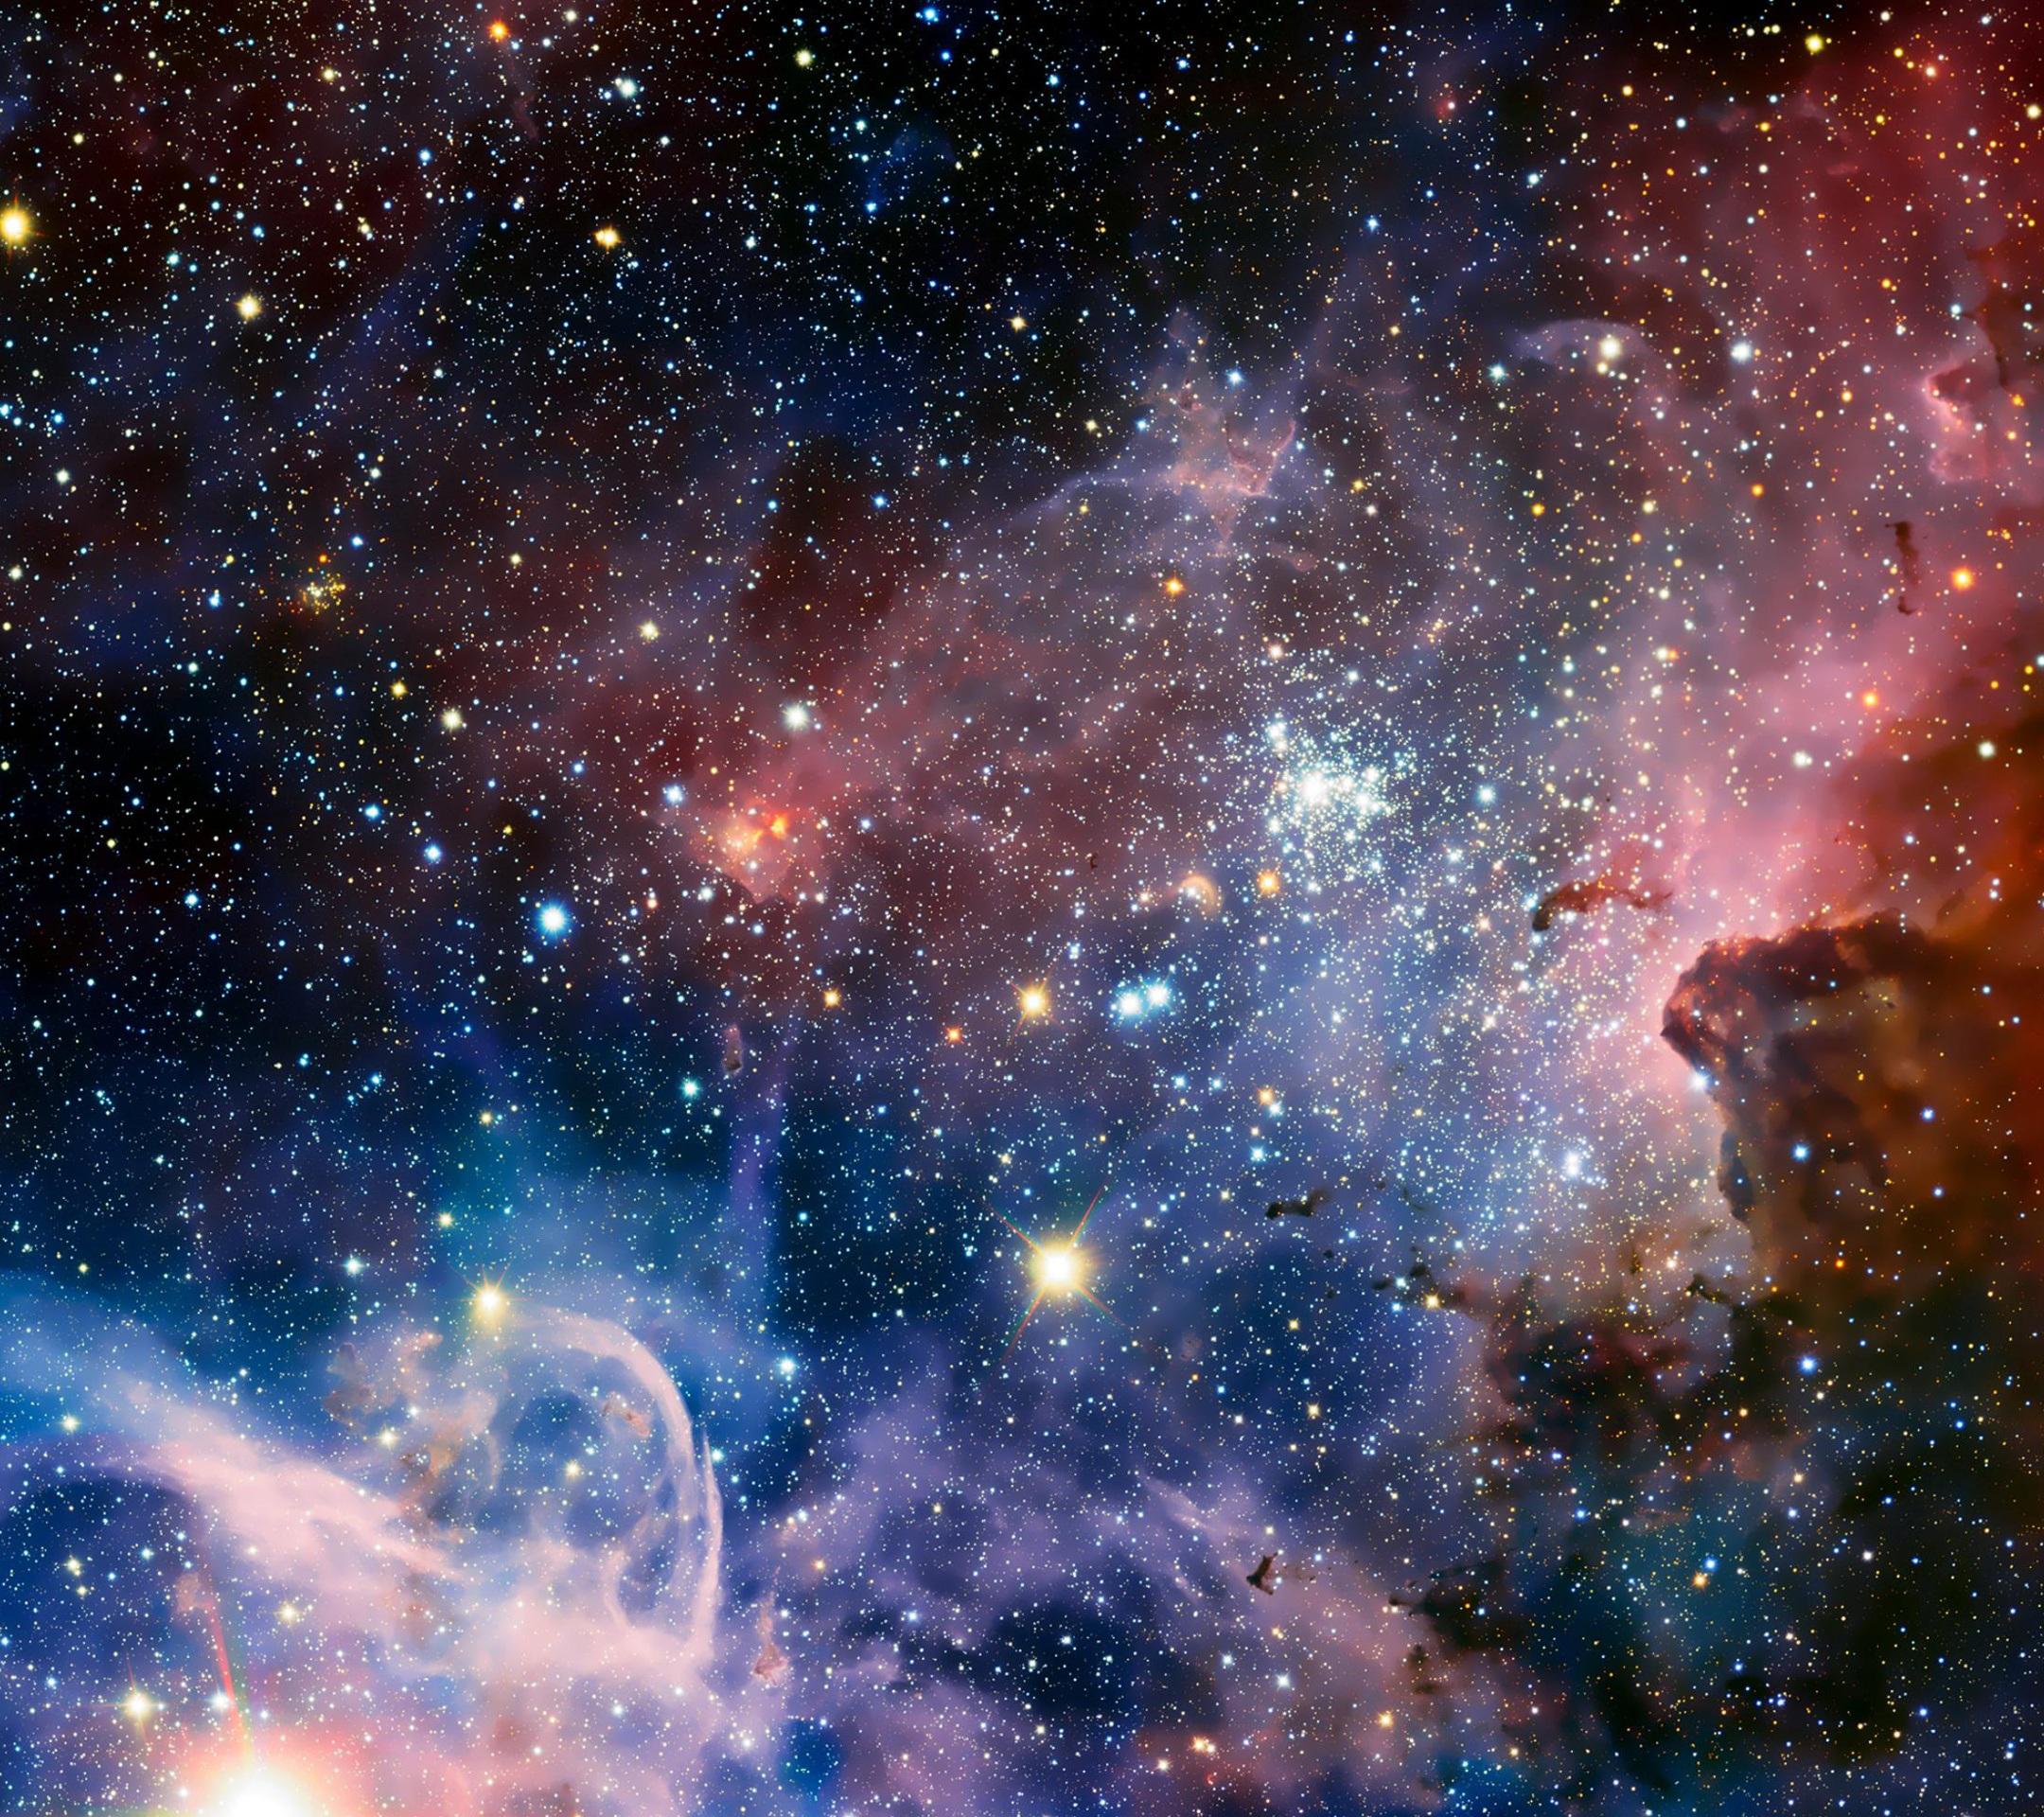 Hd wallpaper galaxy - Nebula Hd Wallpaper Samsung Galaxy S5 Hd Wallpapers Free